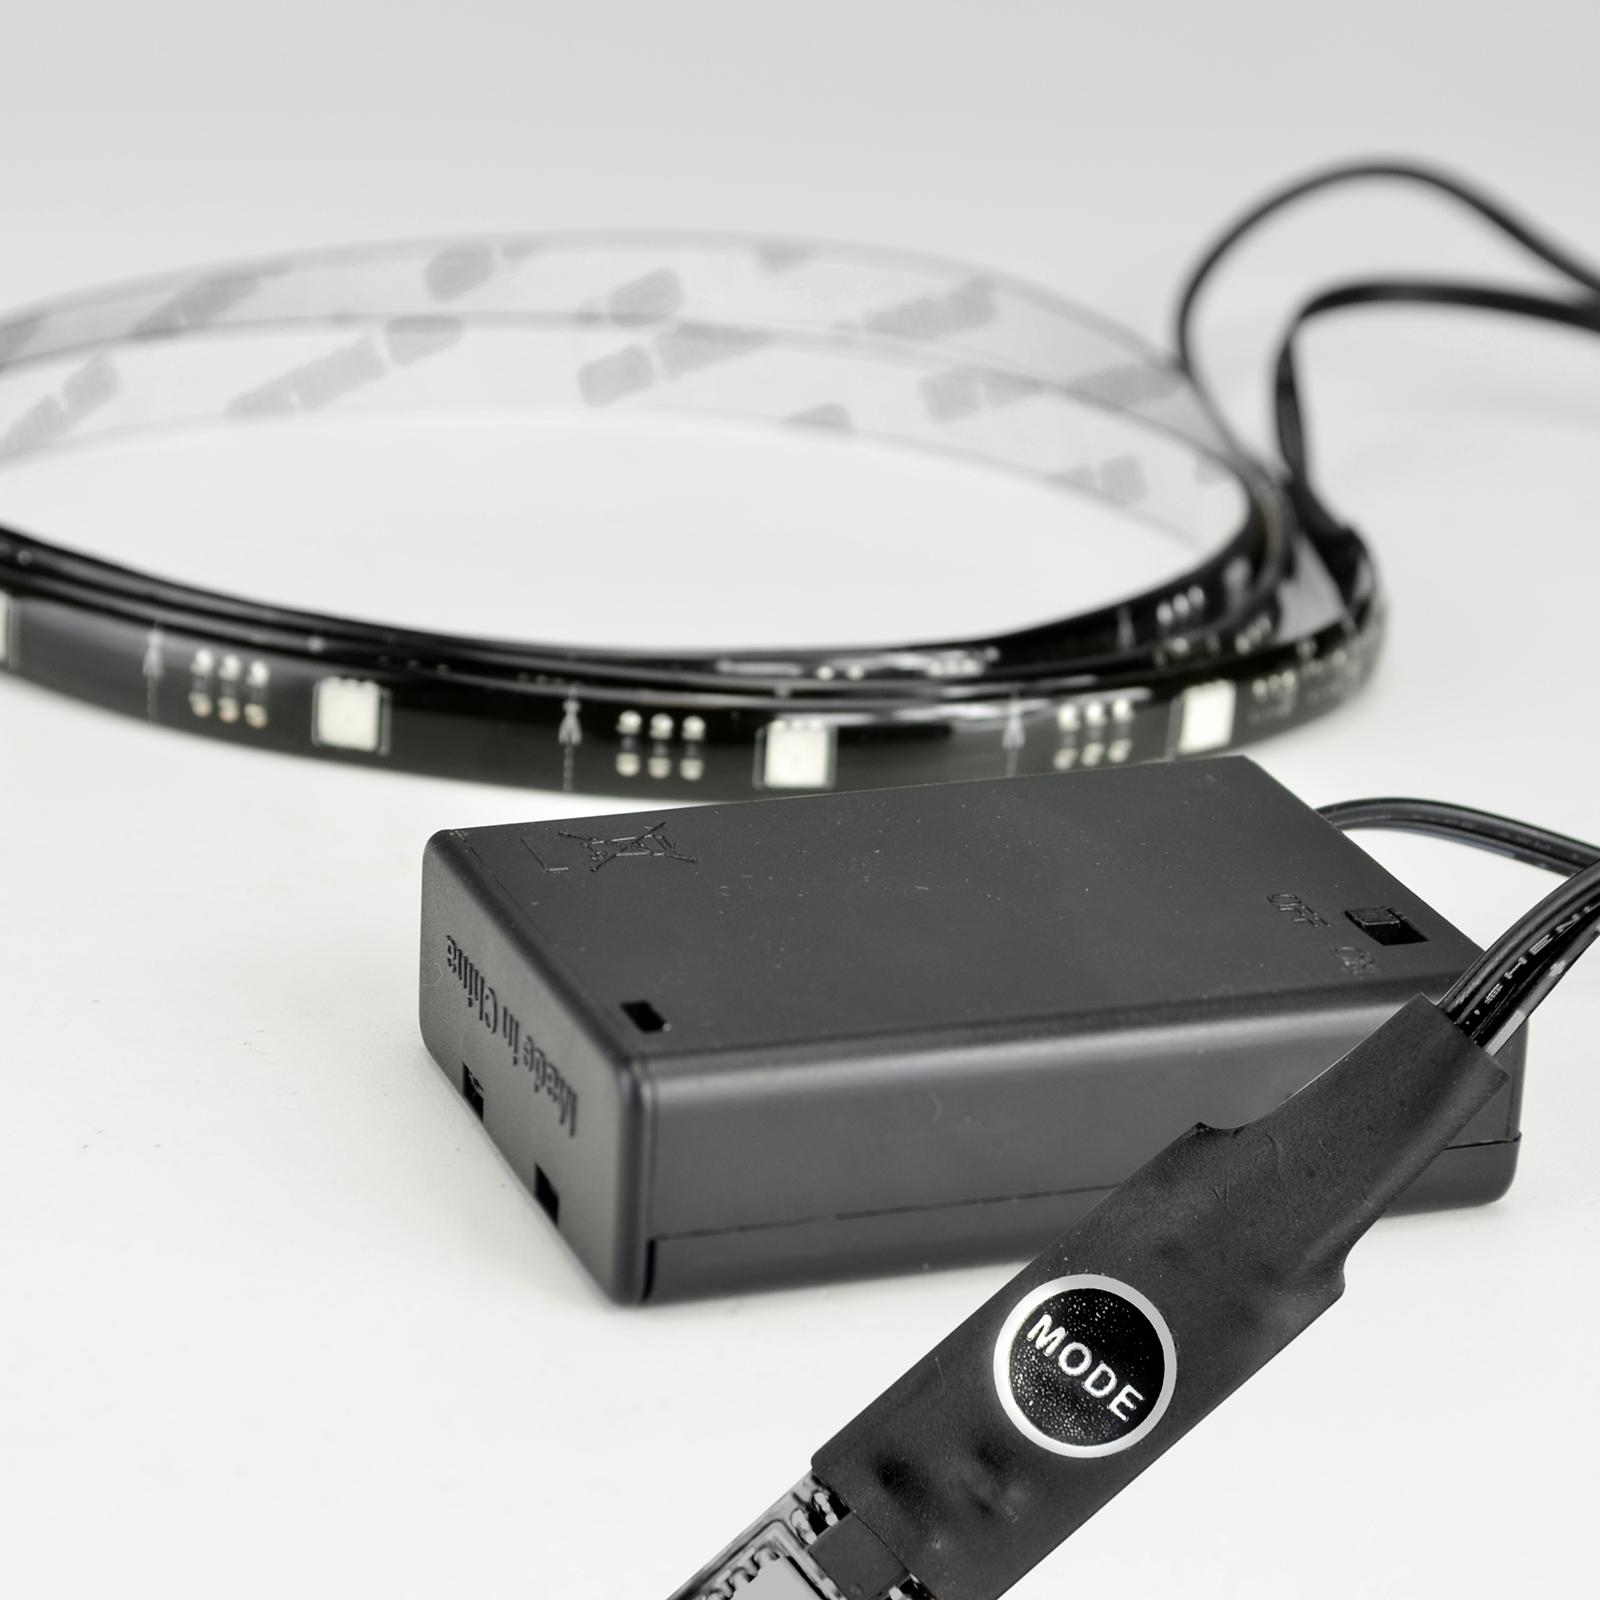 Berühmt X4-LIFE RGB LED Band 1m SMD5050 Batterie / Selbstklebend / IP65 DK65